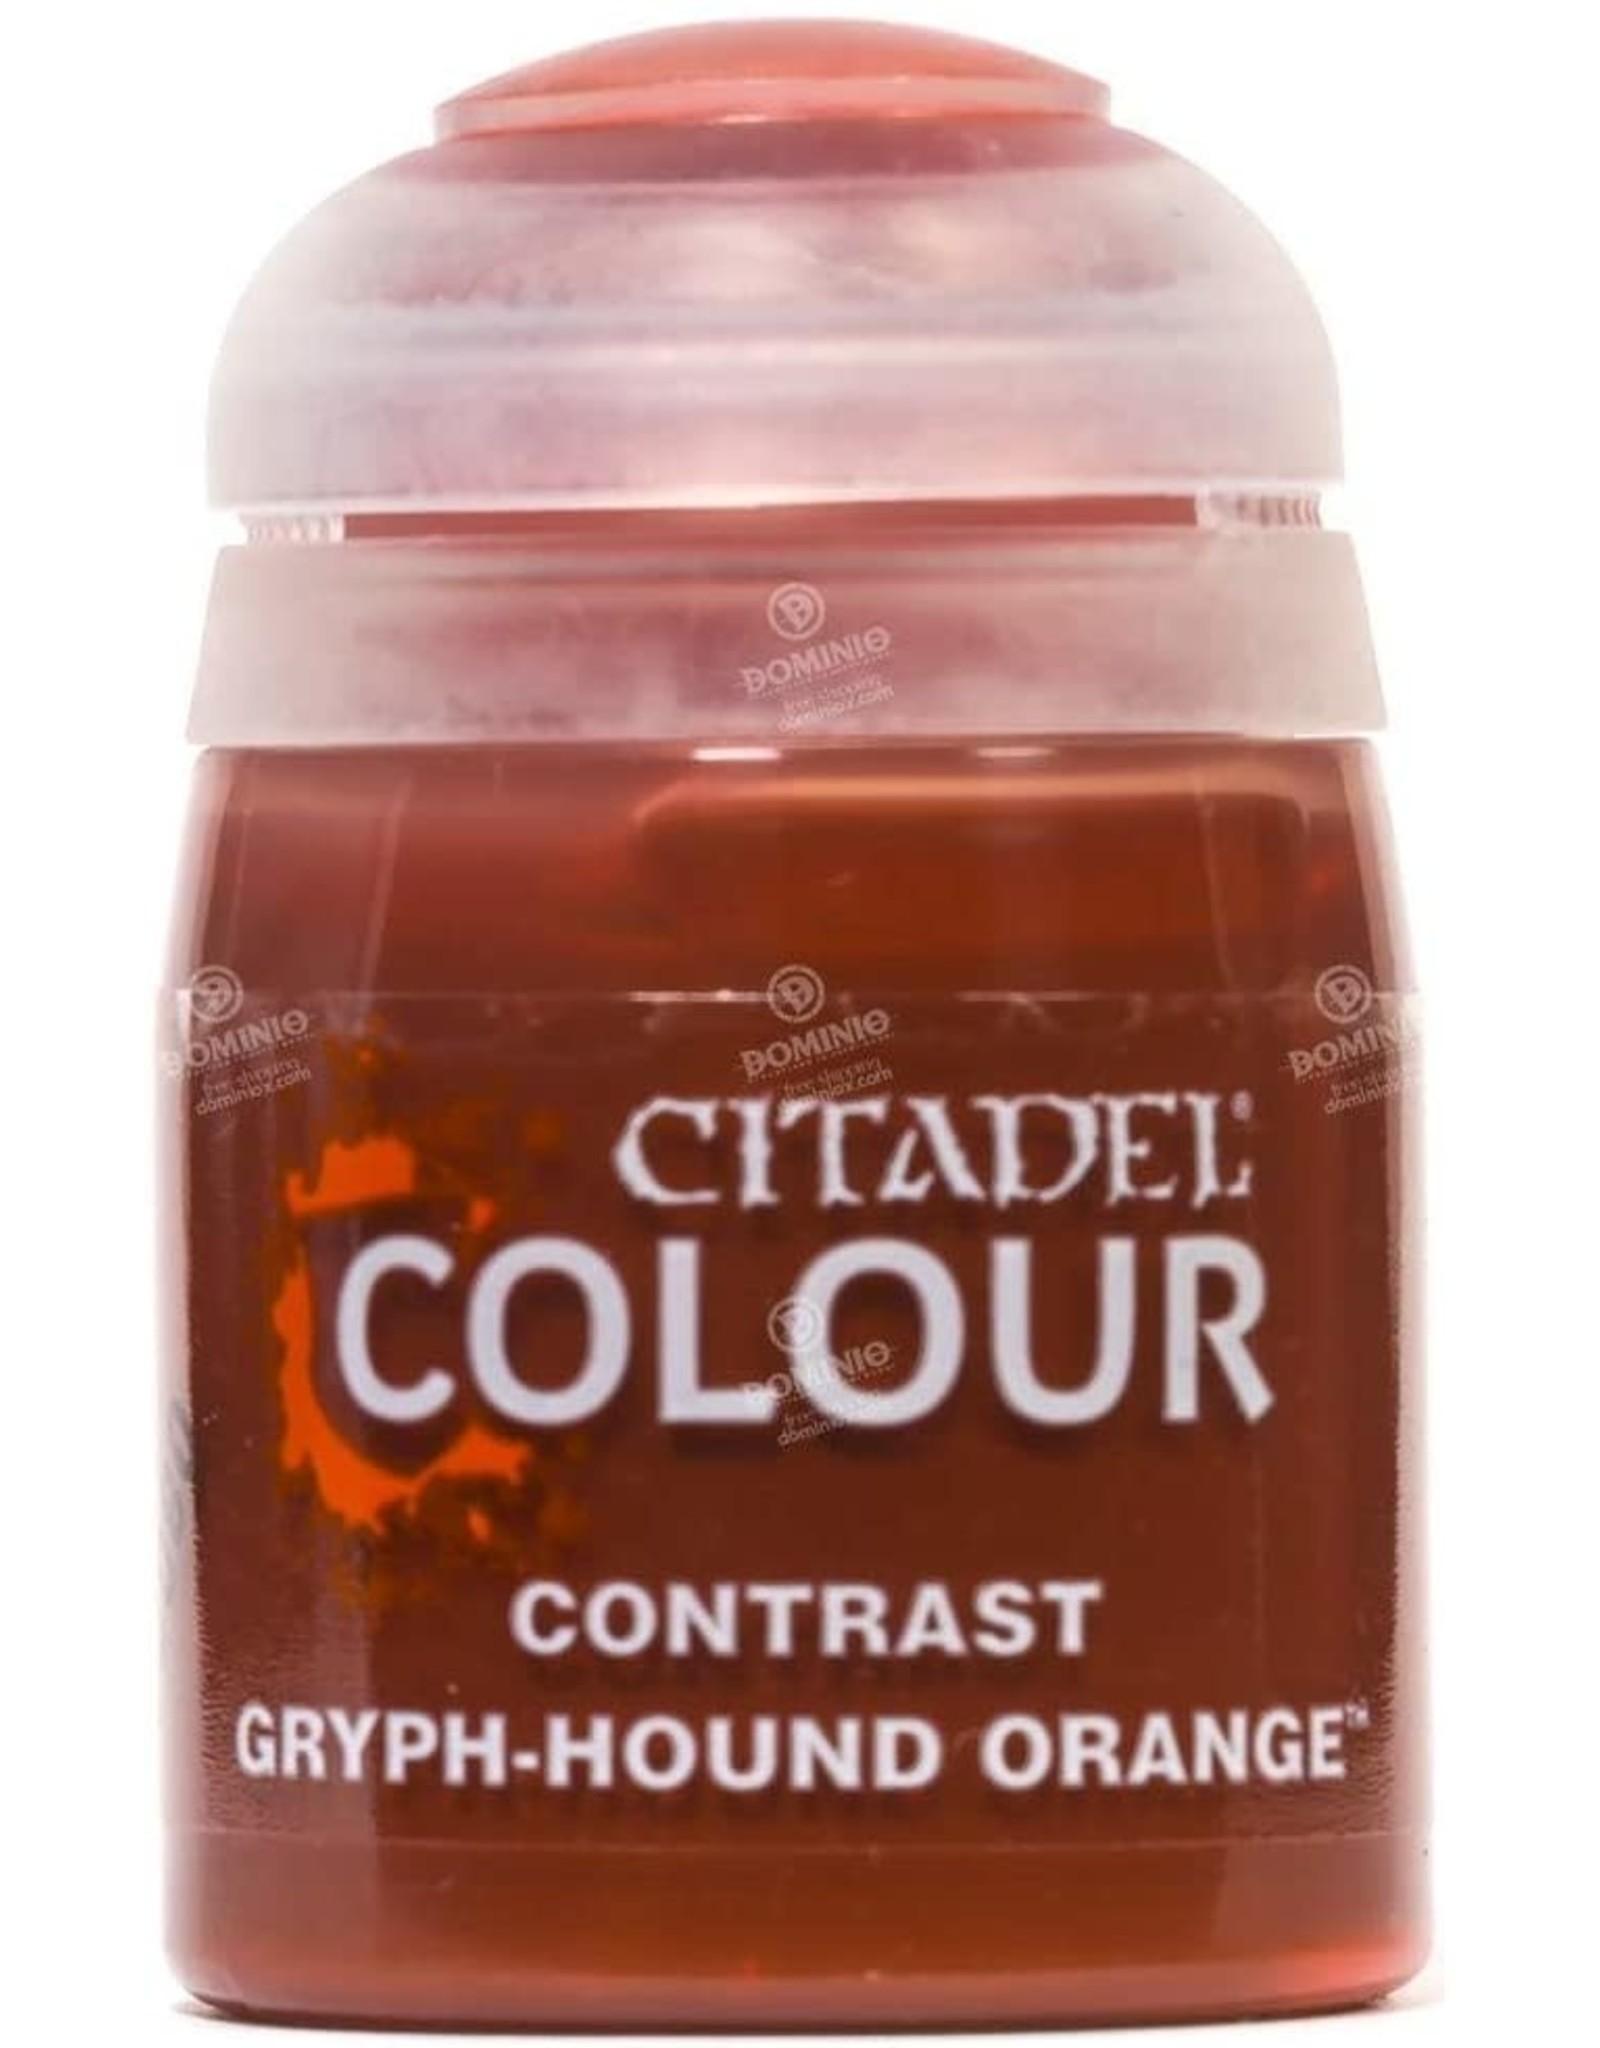 Games Workshop Citadel Paint: Gryph-hound Orange Contrast (18 ml)